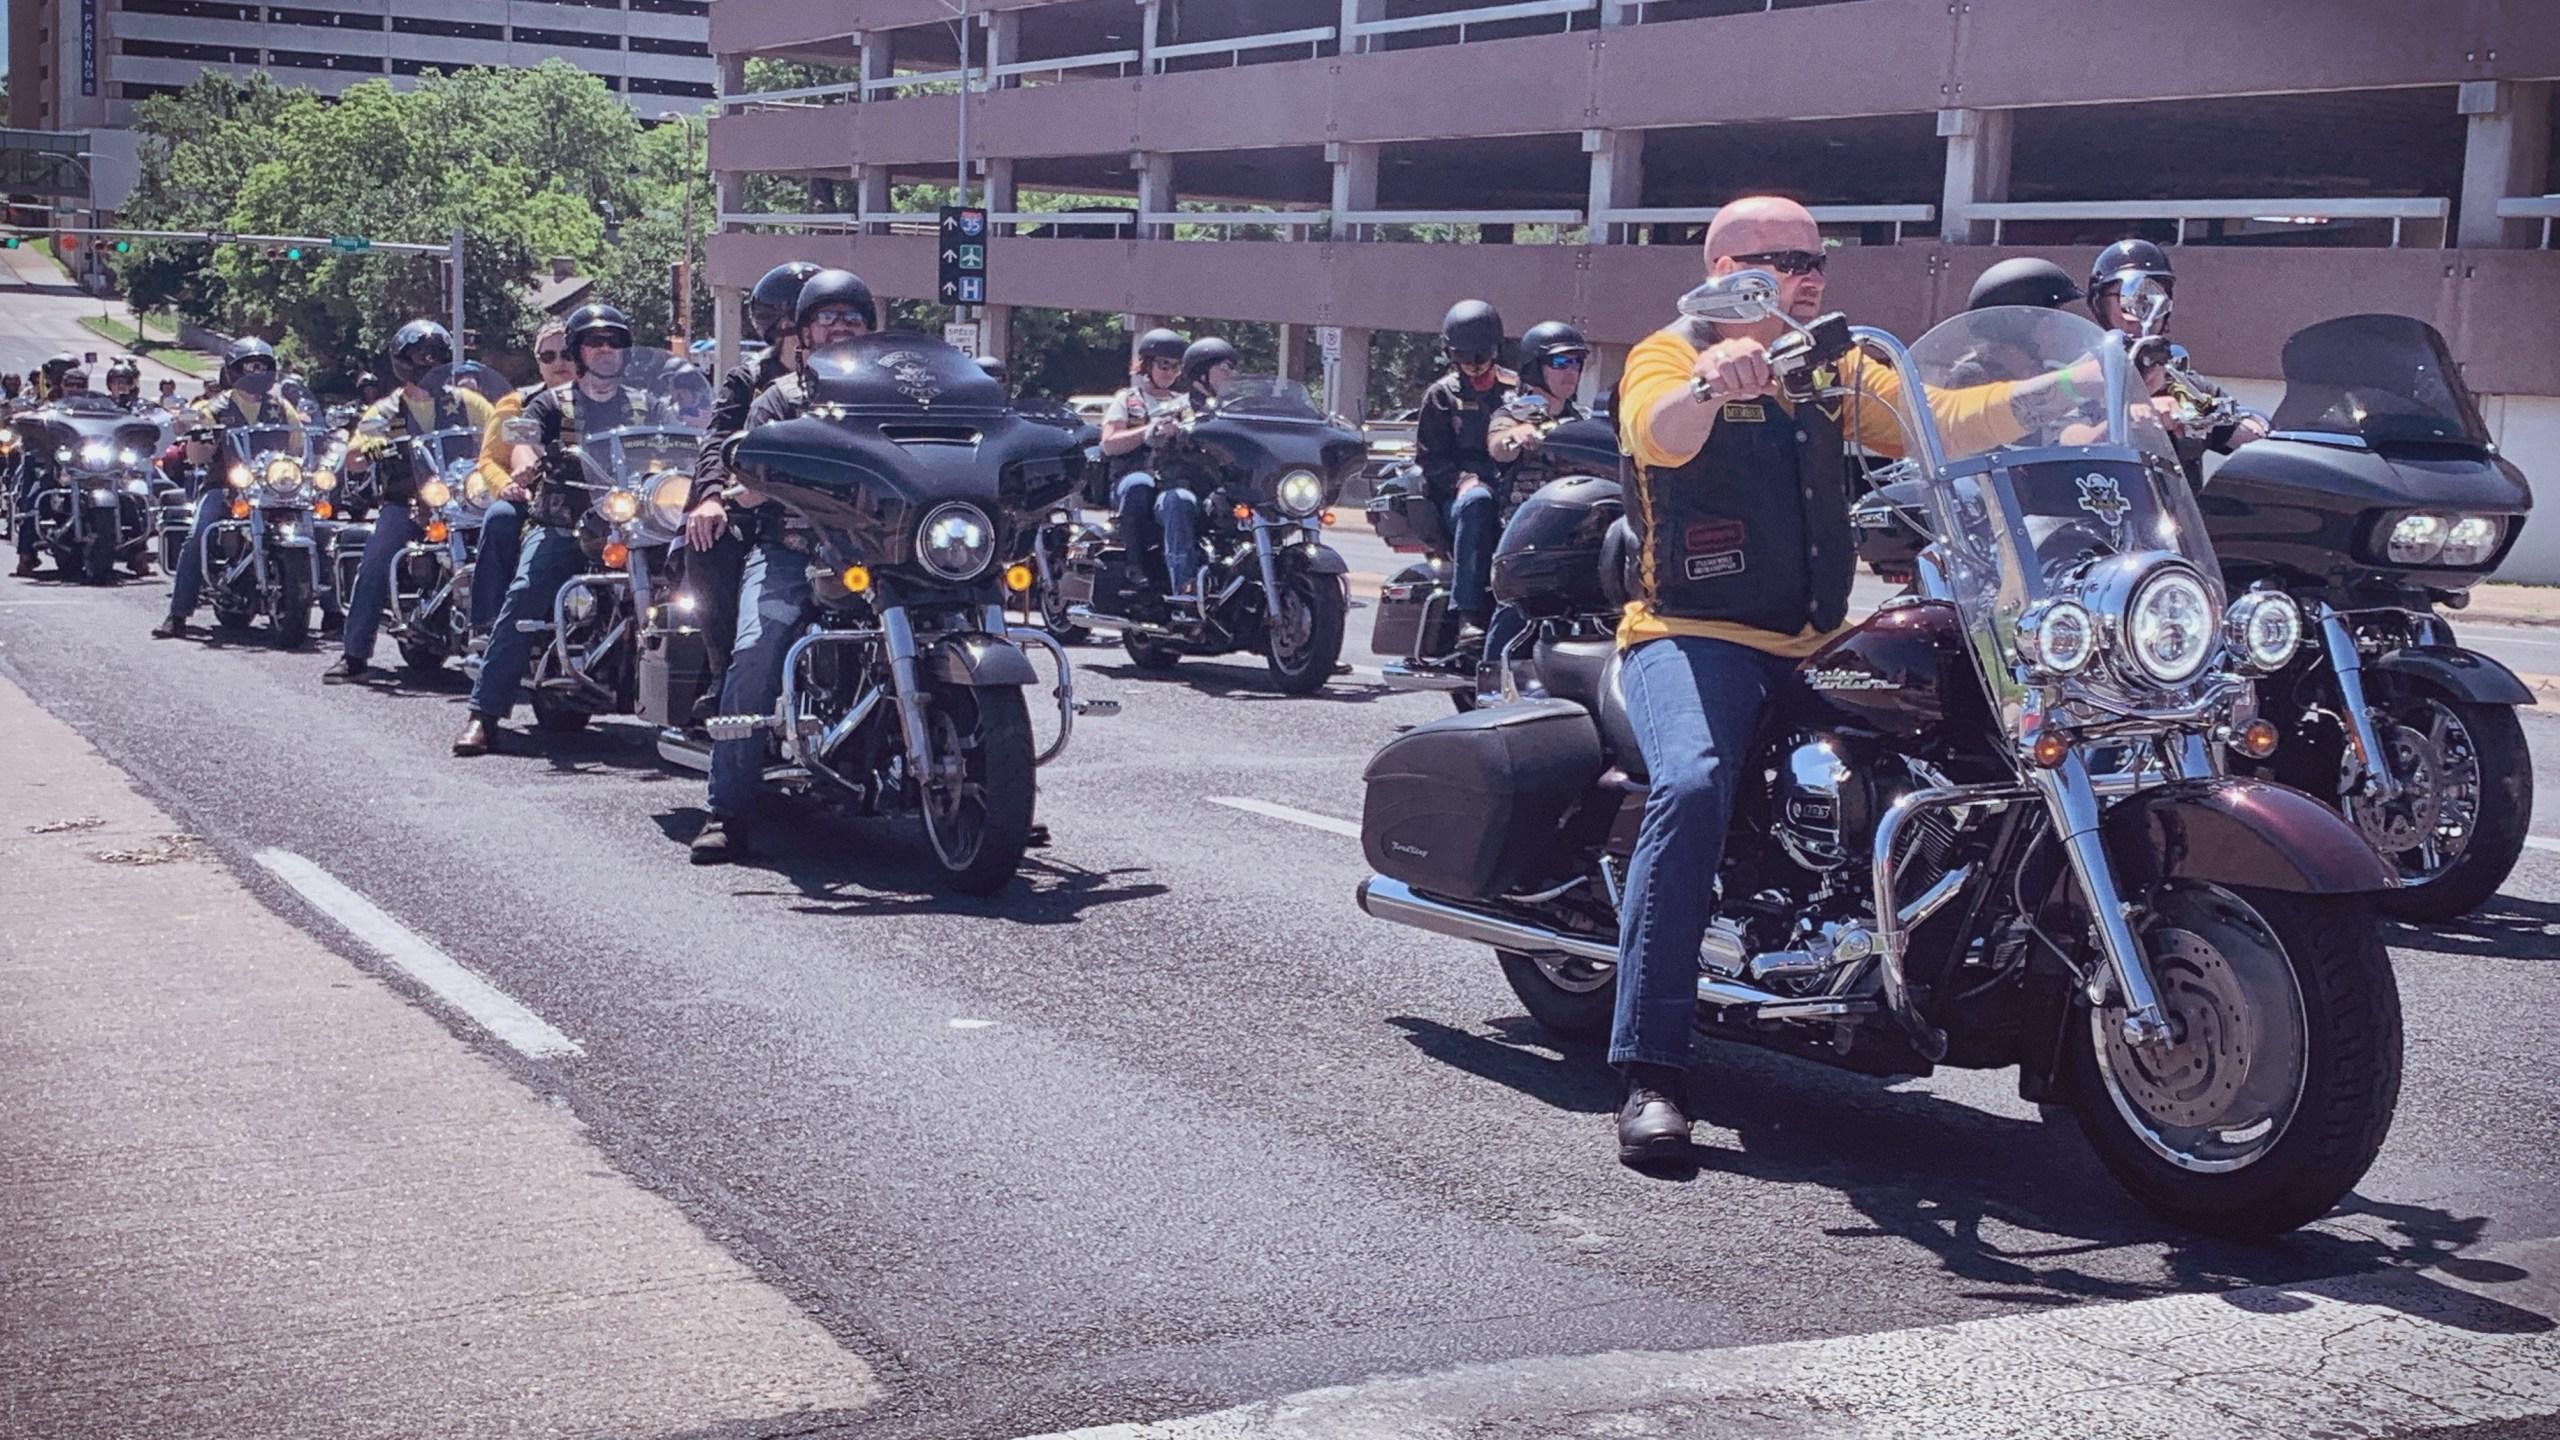 18th annual Ride for the Fallen